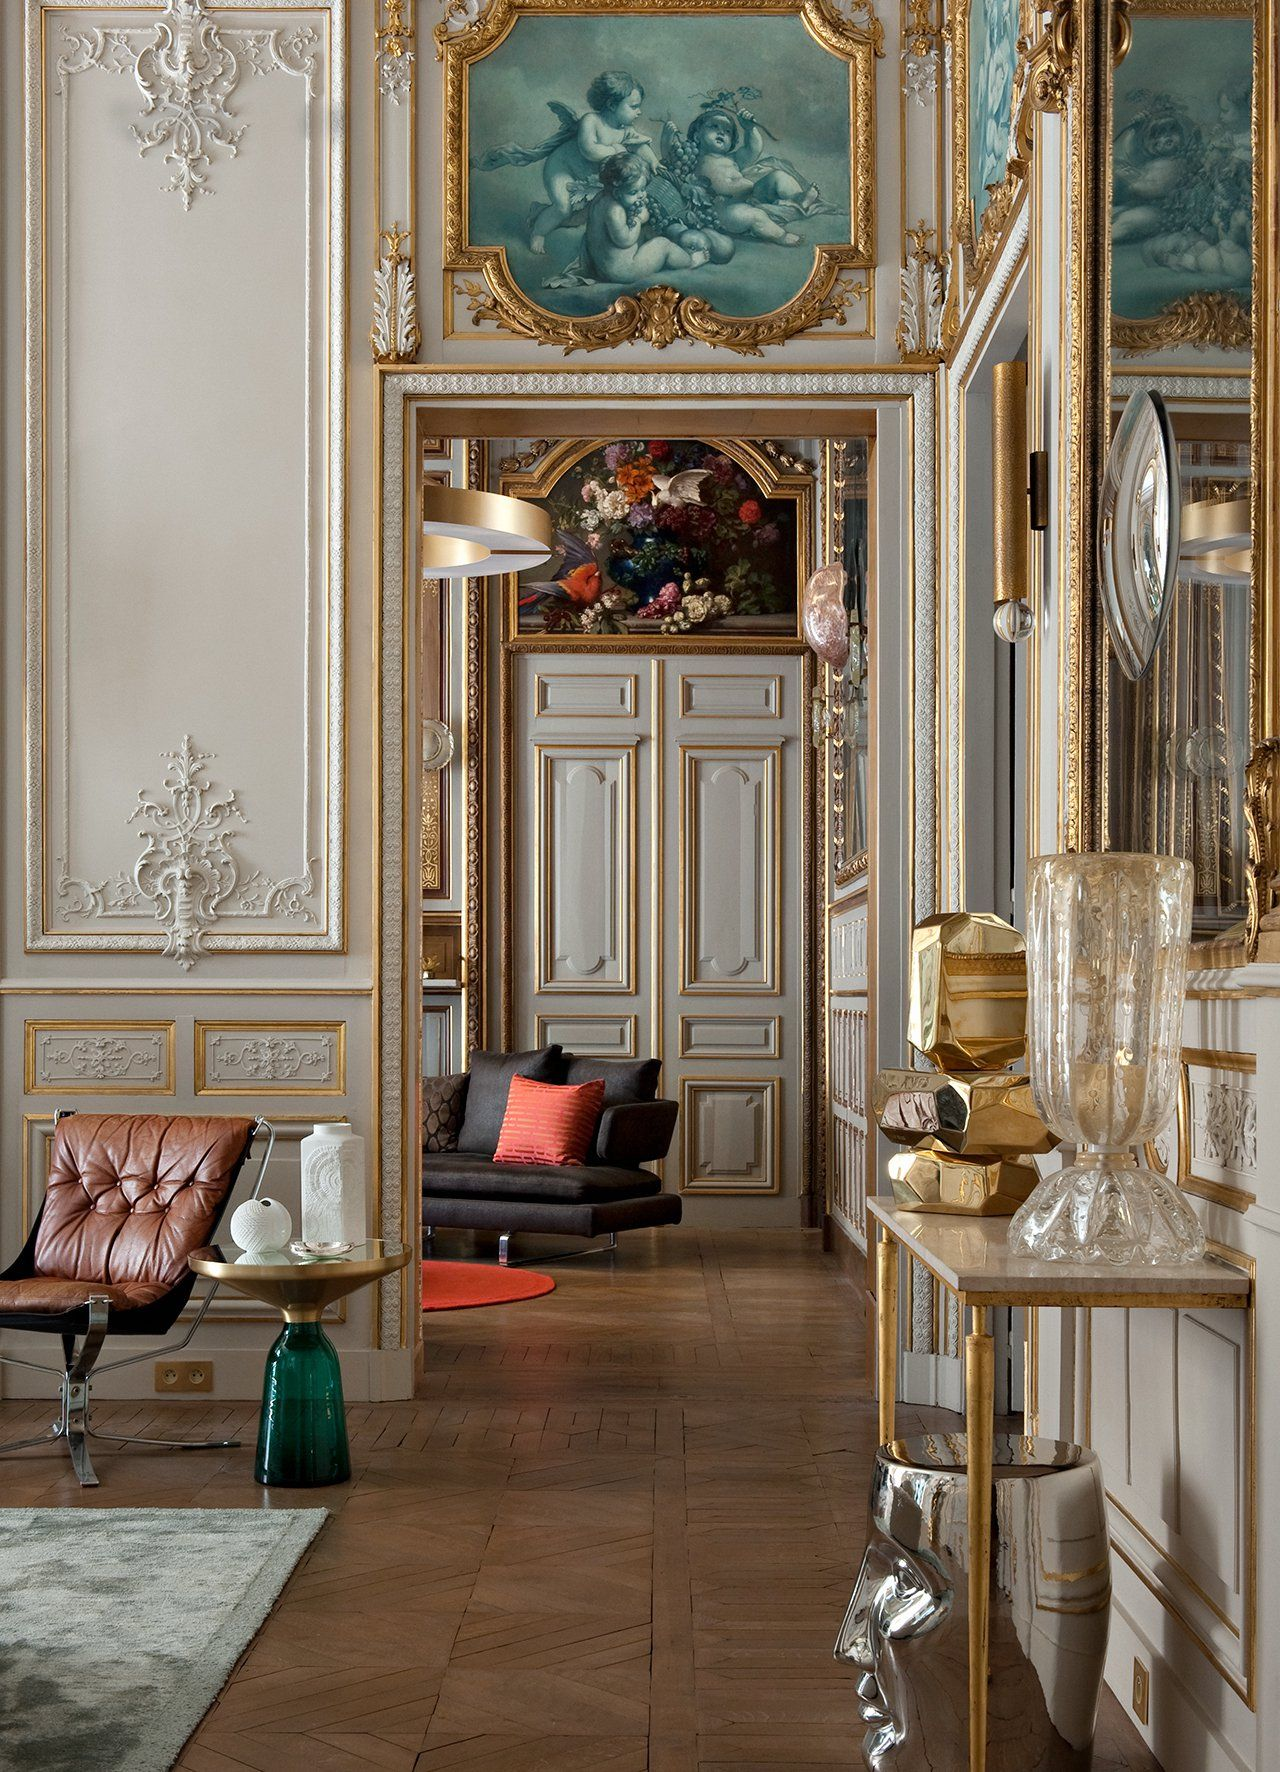 Interior Design By Klavs Rosenfalck Photography Nicolas Mathéus Elle Décoration Scoop From Kaleidoscope Gestalten 2016